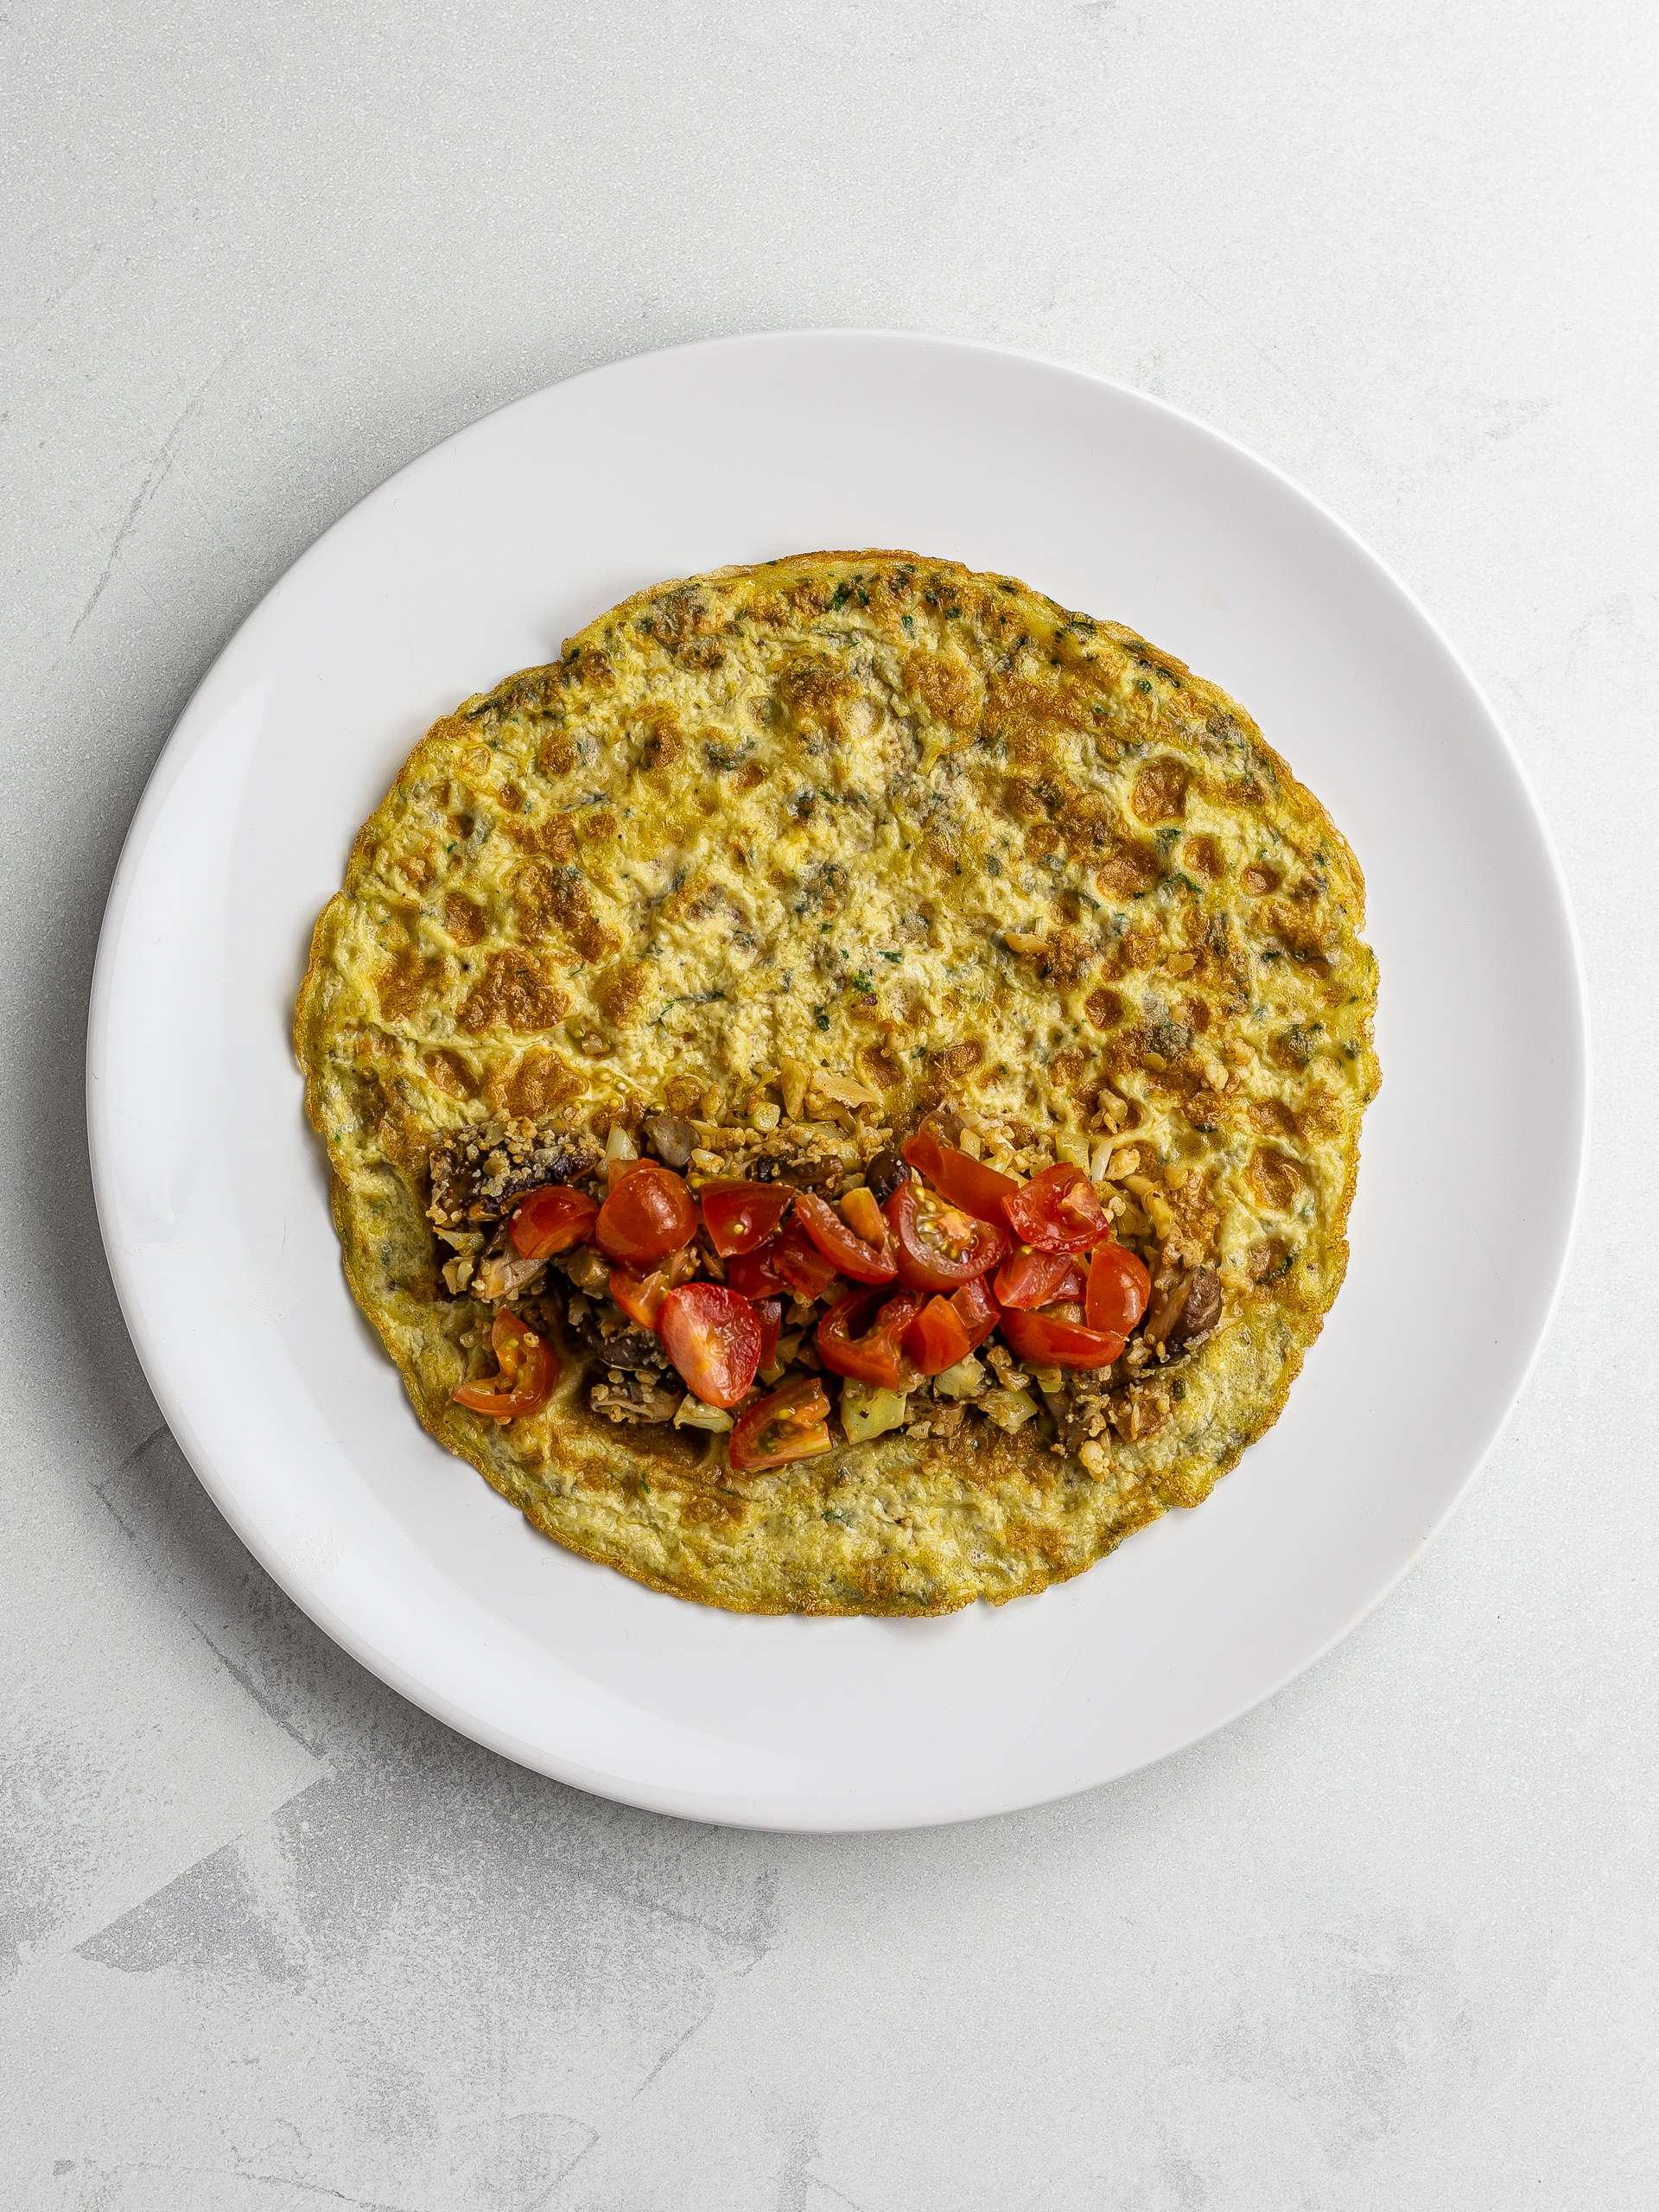 low-carb burrito with mushroom cauliflower rice